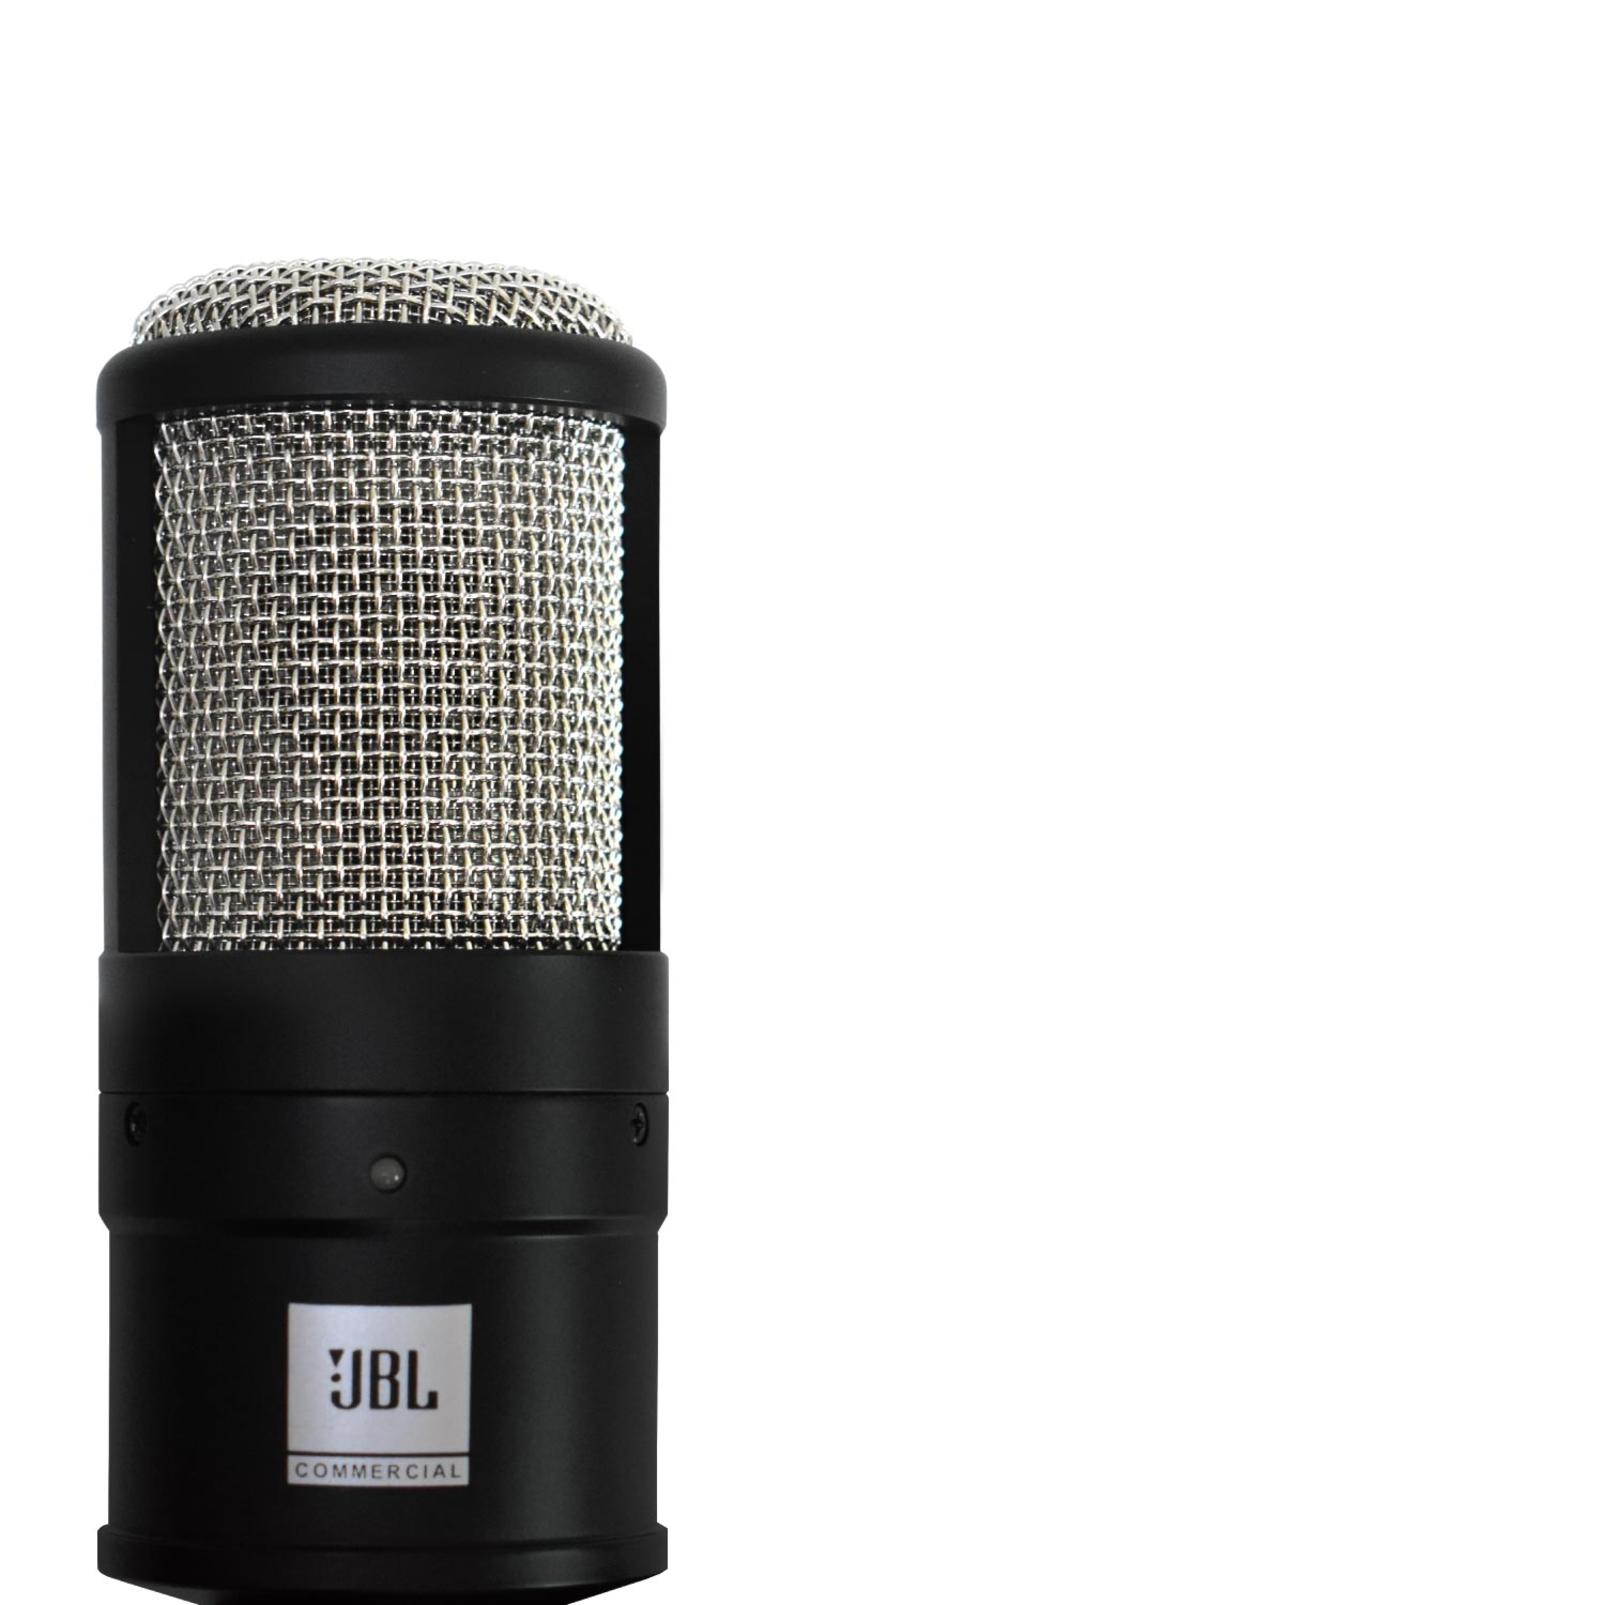 CSSM100 - Black - Studio Condenser Microphone - Detailshot 4